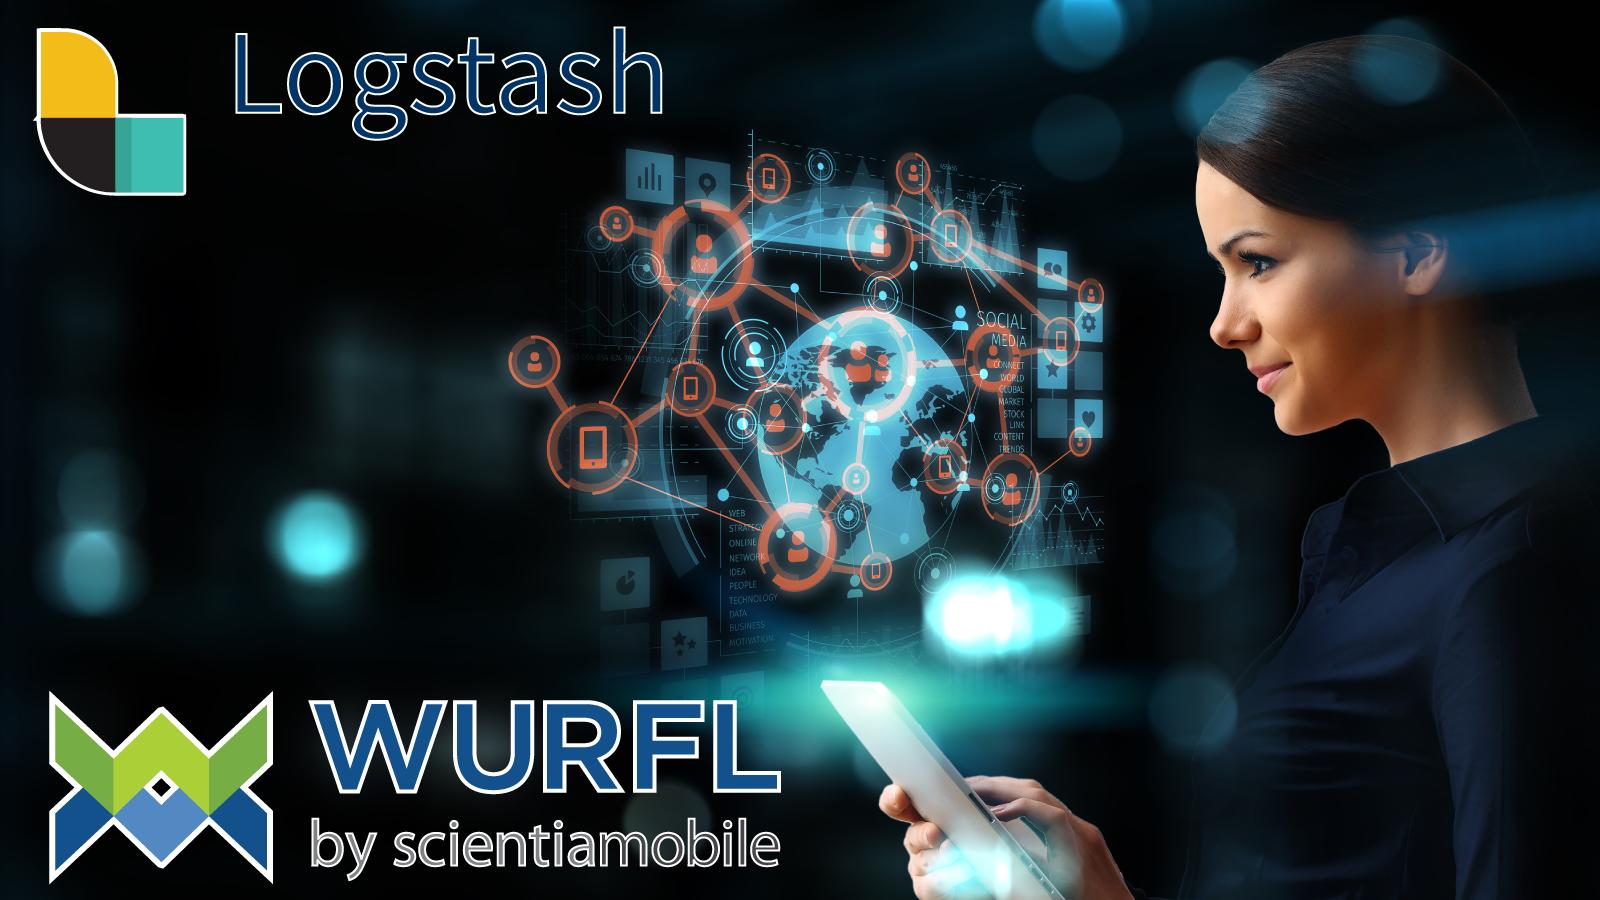 Logstash-Wurfl-device-detection-Cloud-woman-black